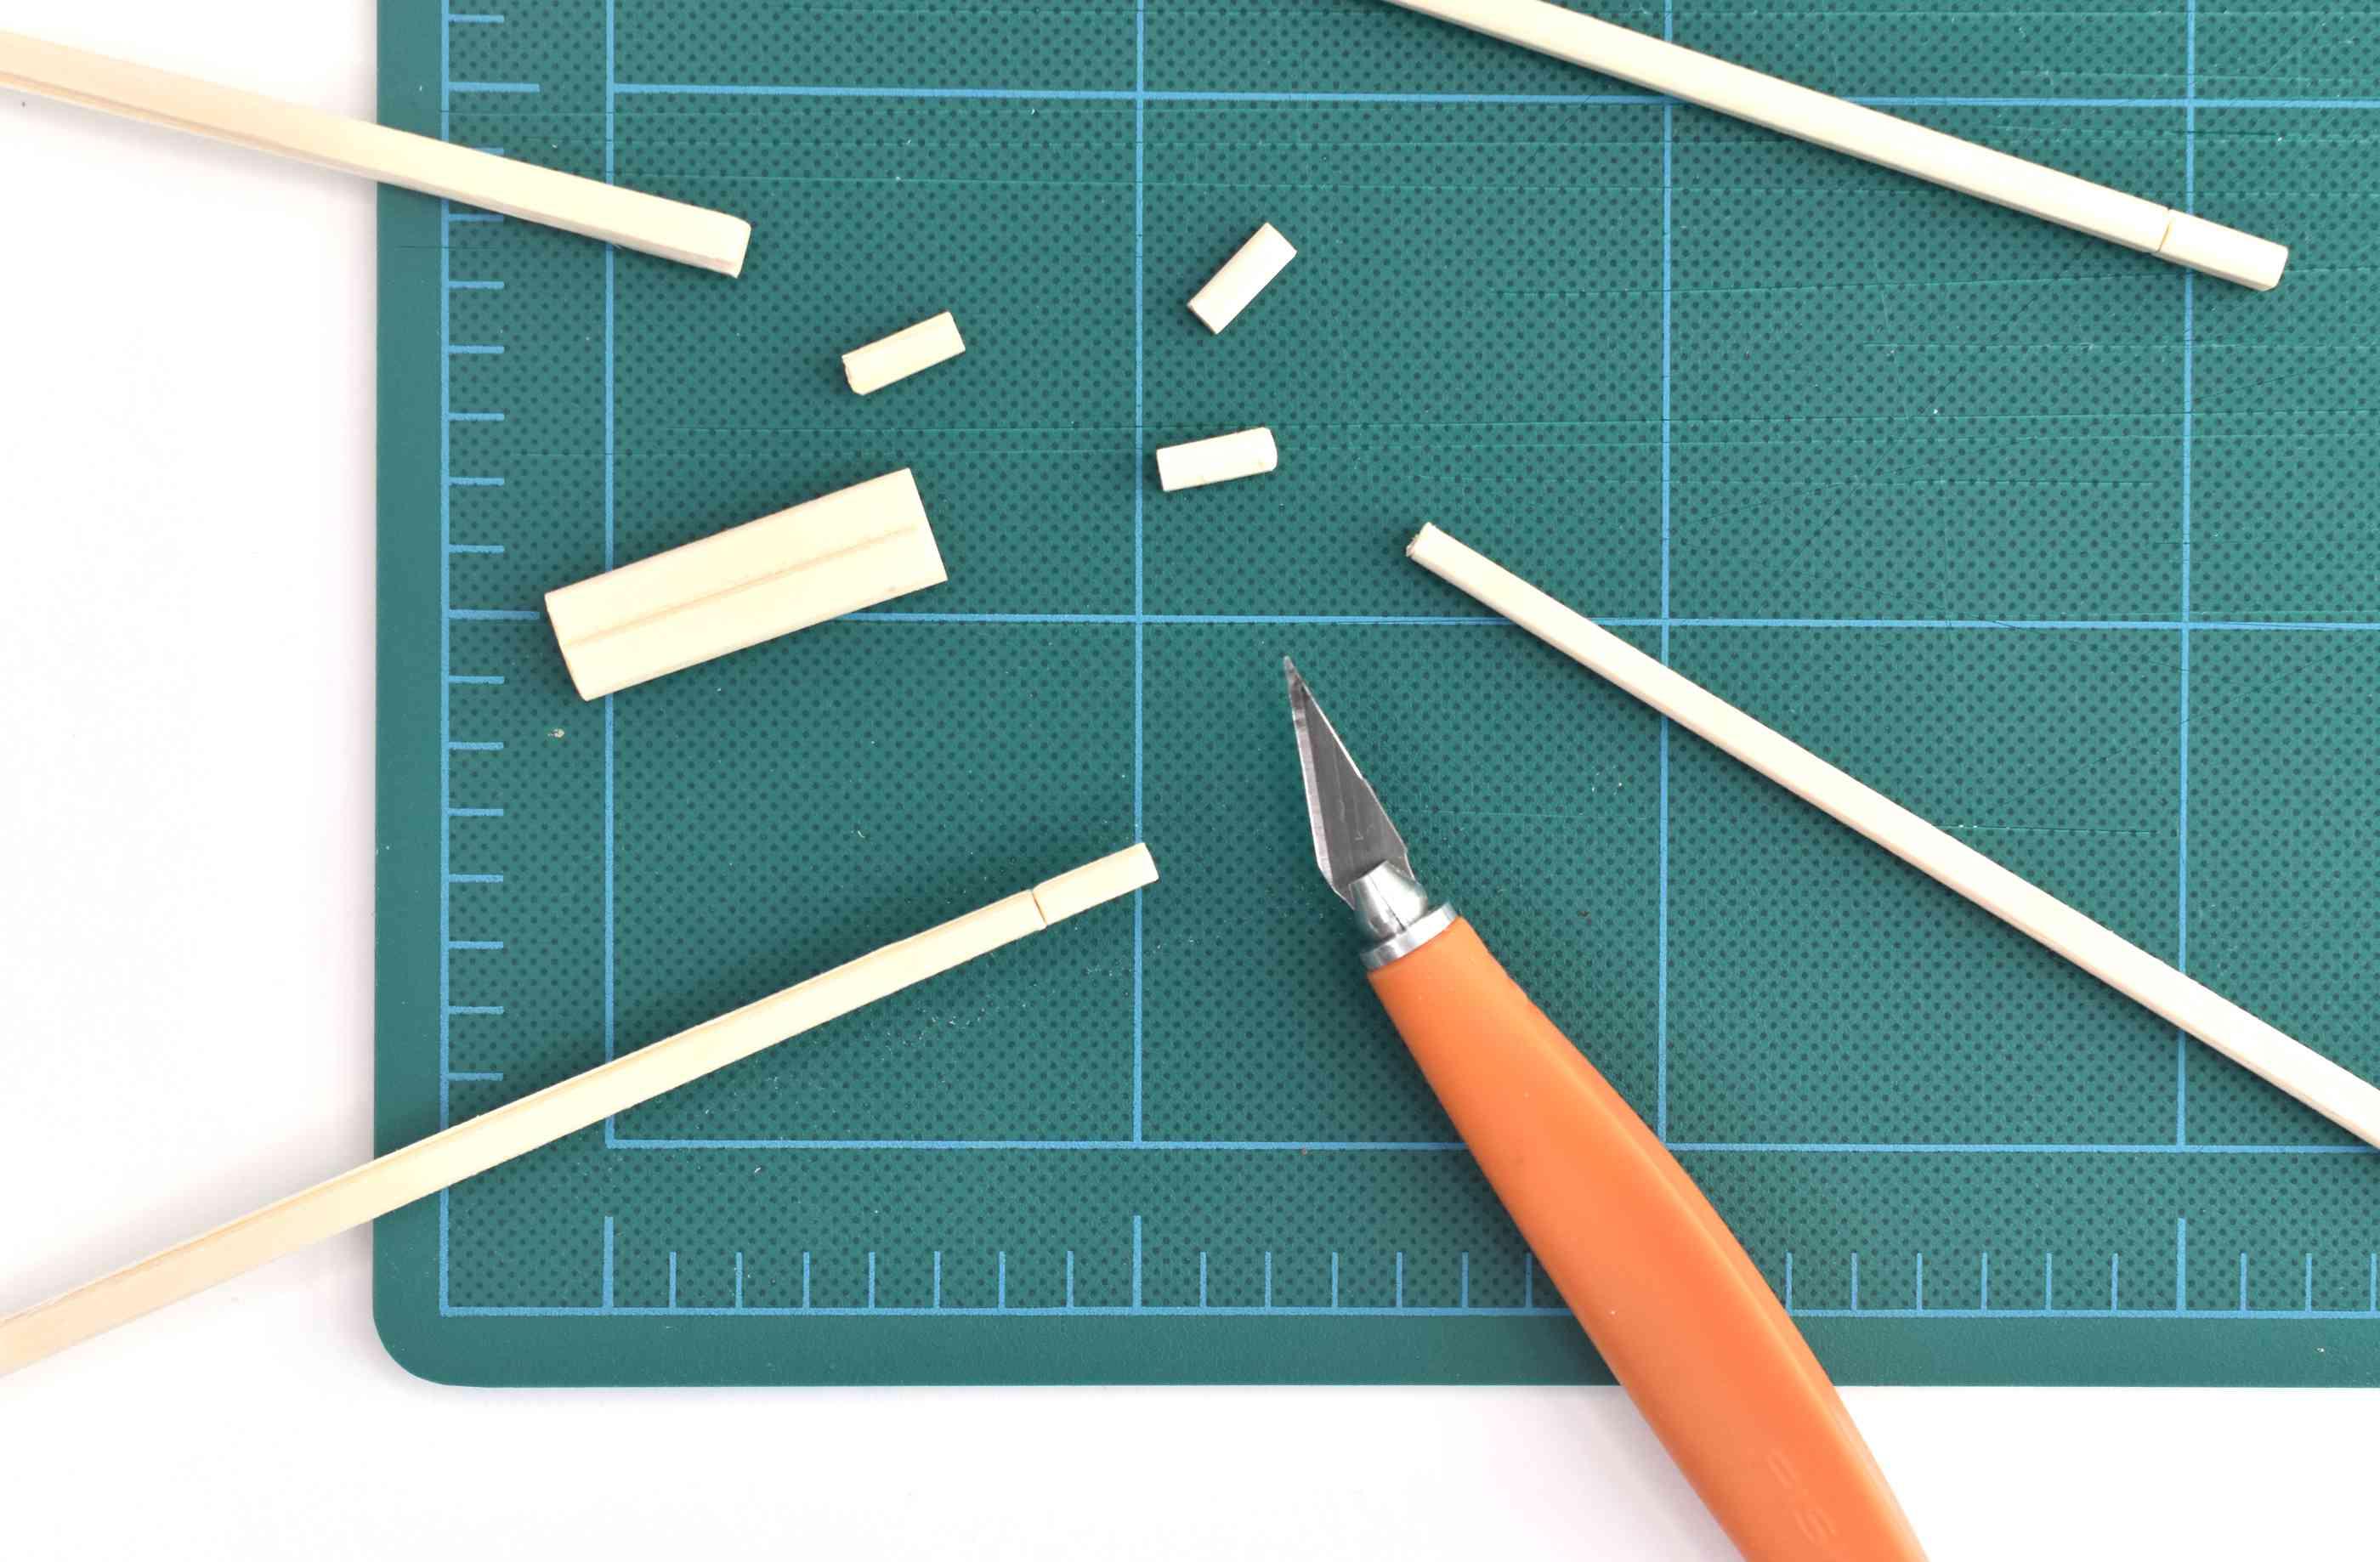 Cut the Chopsticks with a Craft Knife